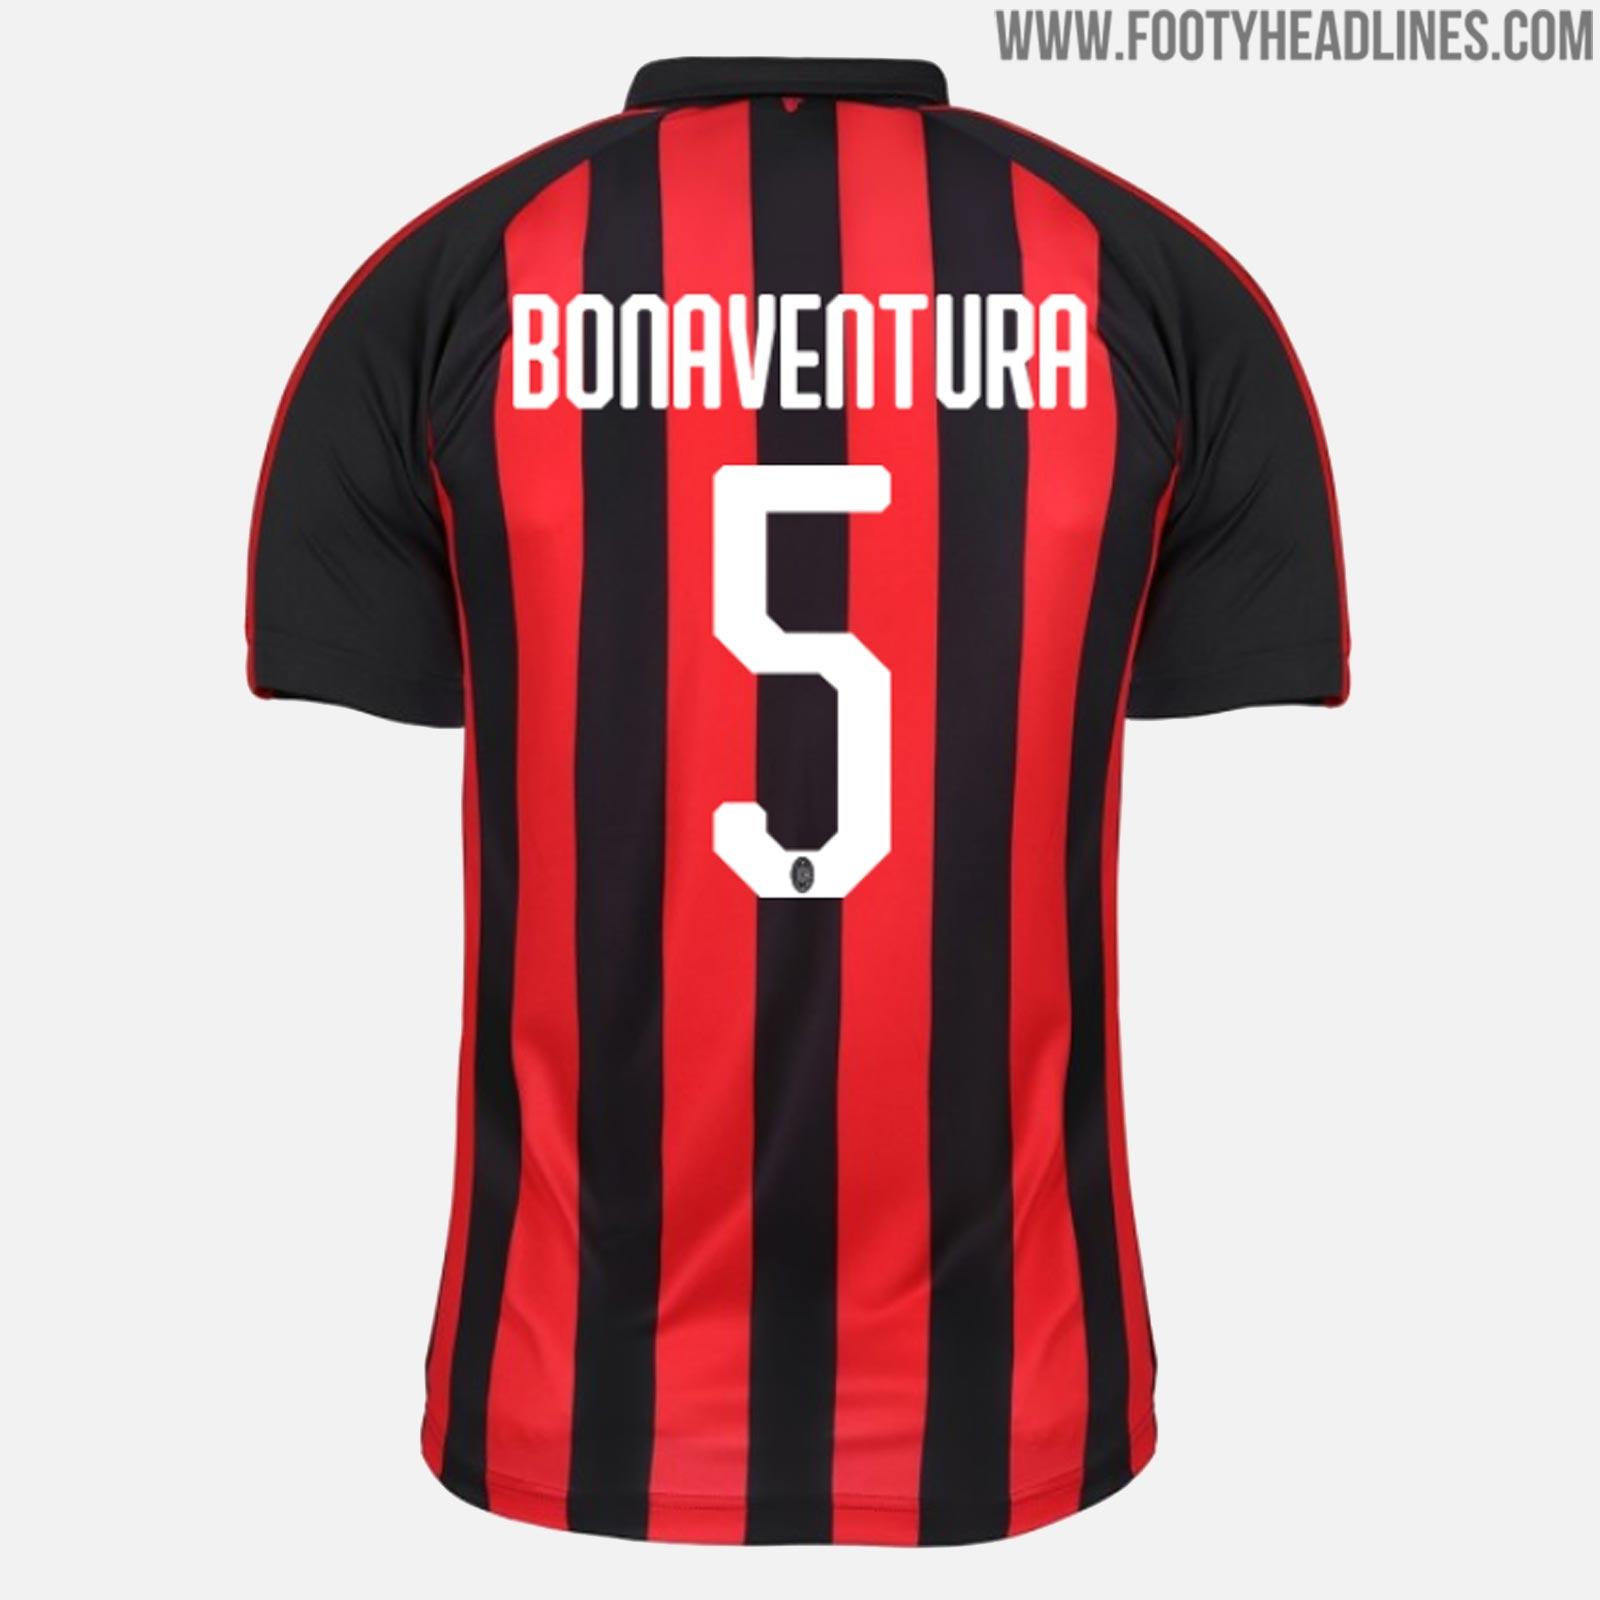 Puma AC Milan 18-19 Kit Font Revealed | Futbolgrid